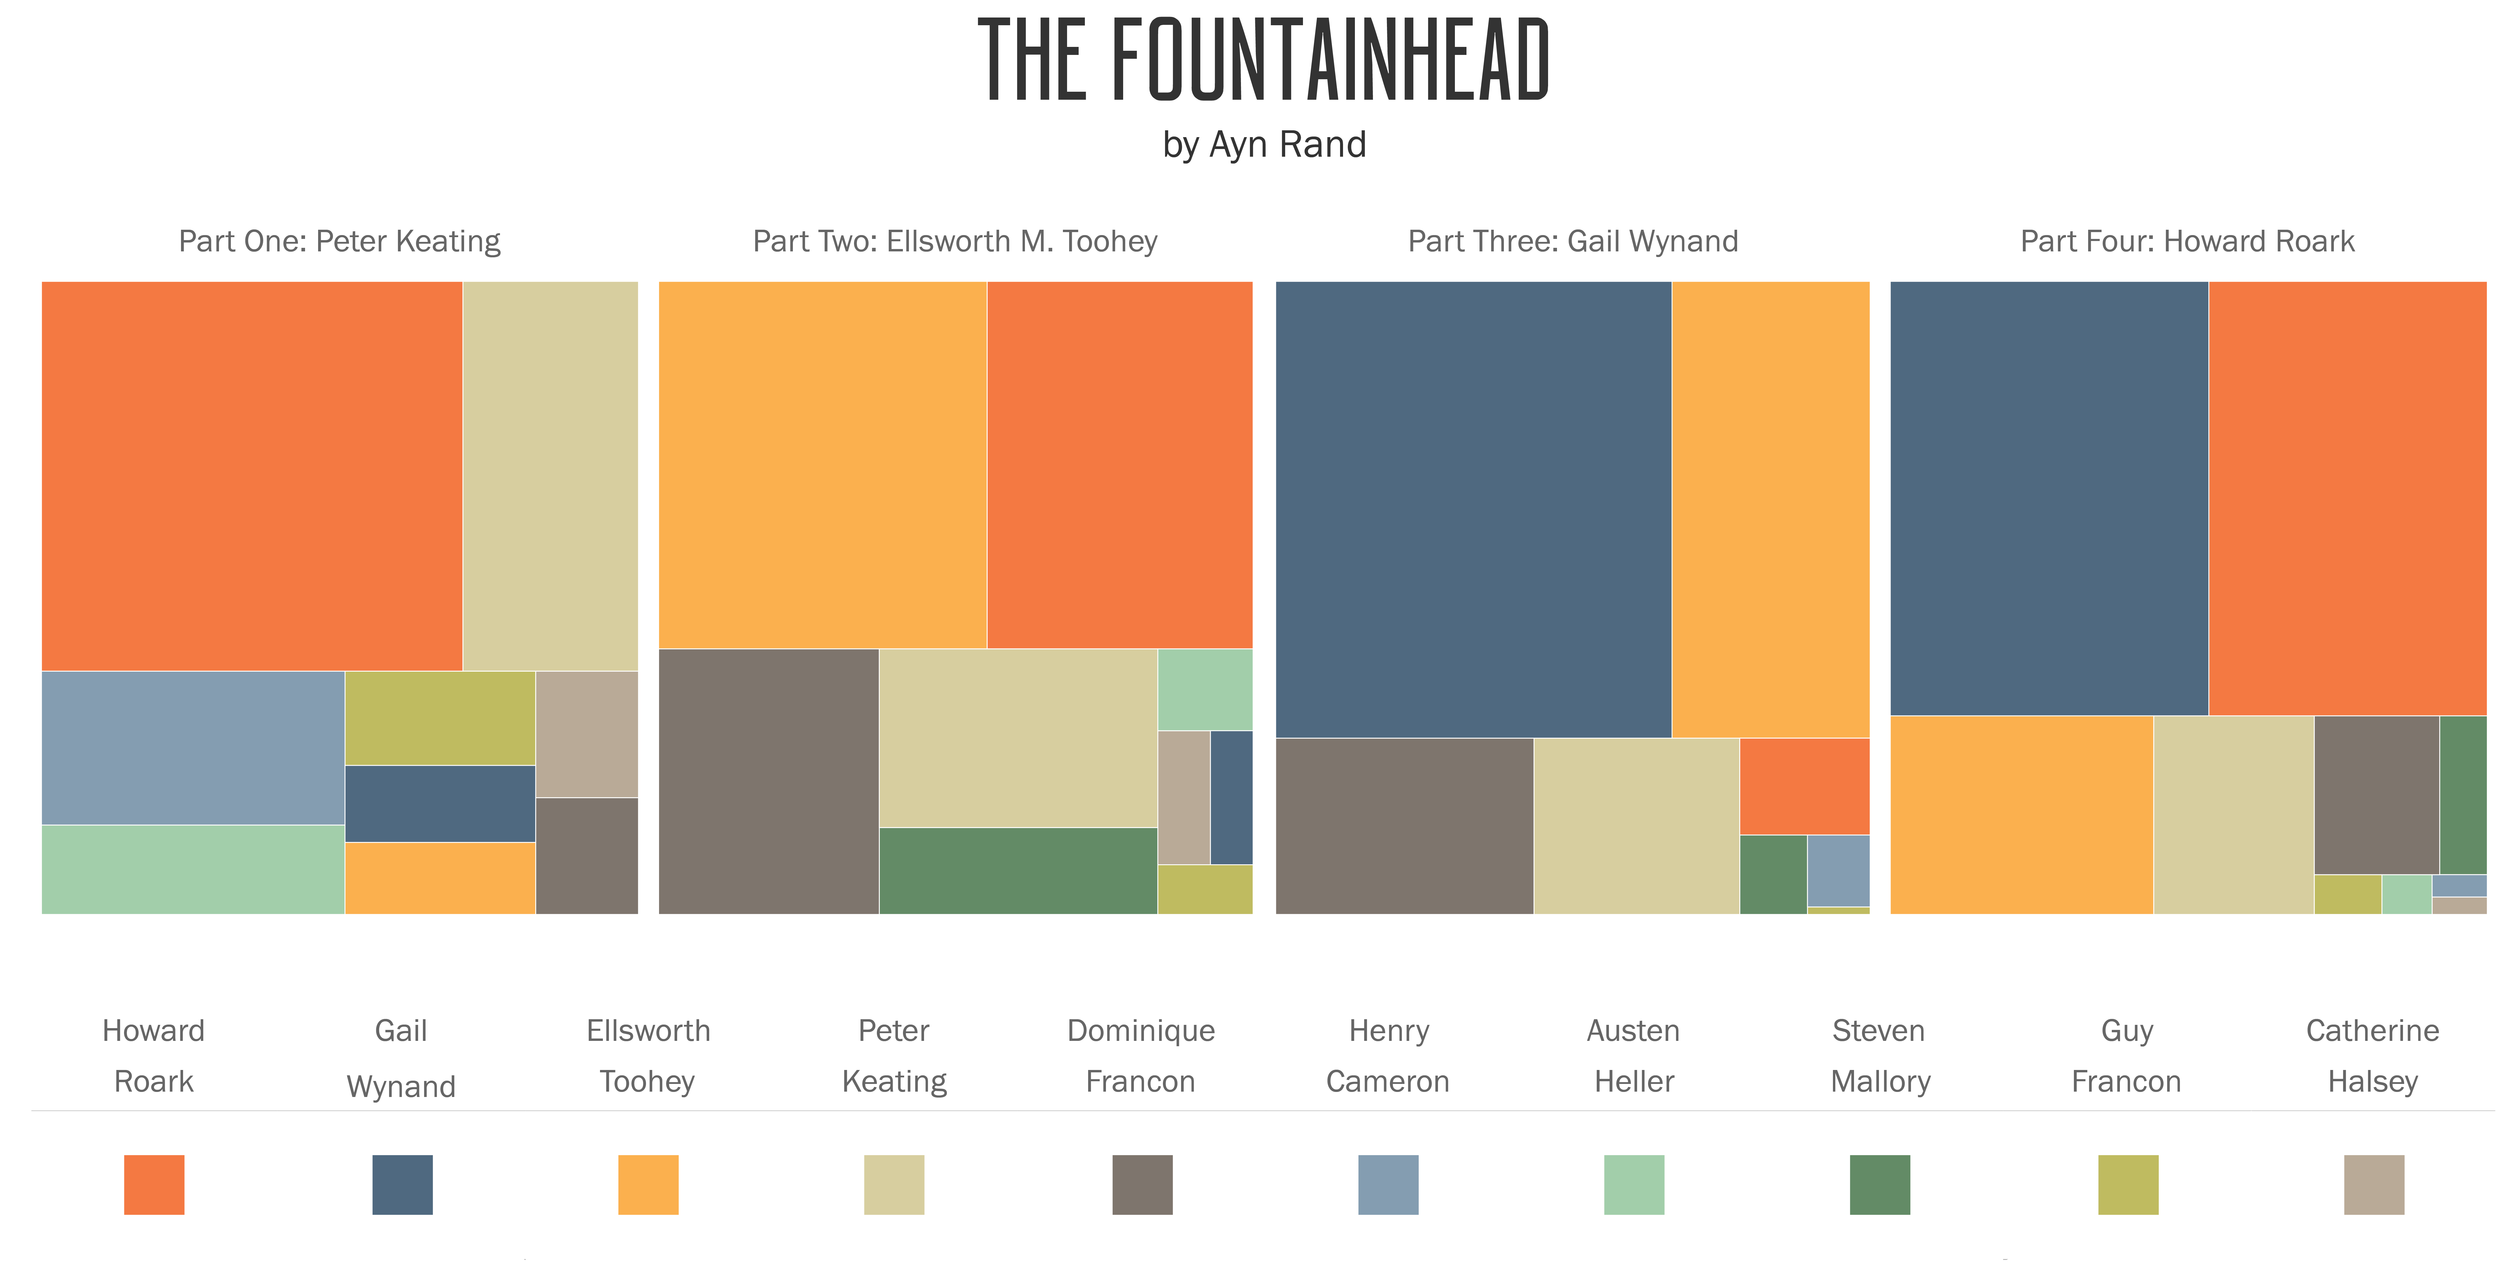 TheFountainheadDashboard.png